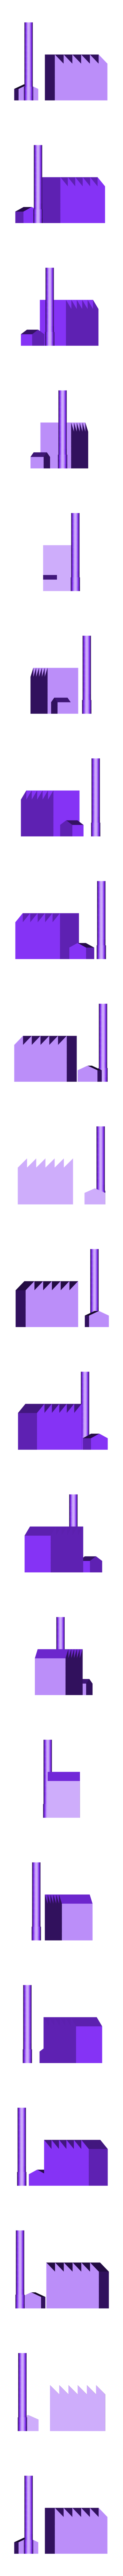 usine roubaix.stl Download free STL file Northern plant • 3D printable model, rezaco59